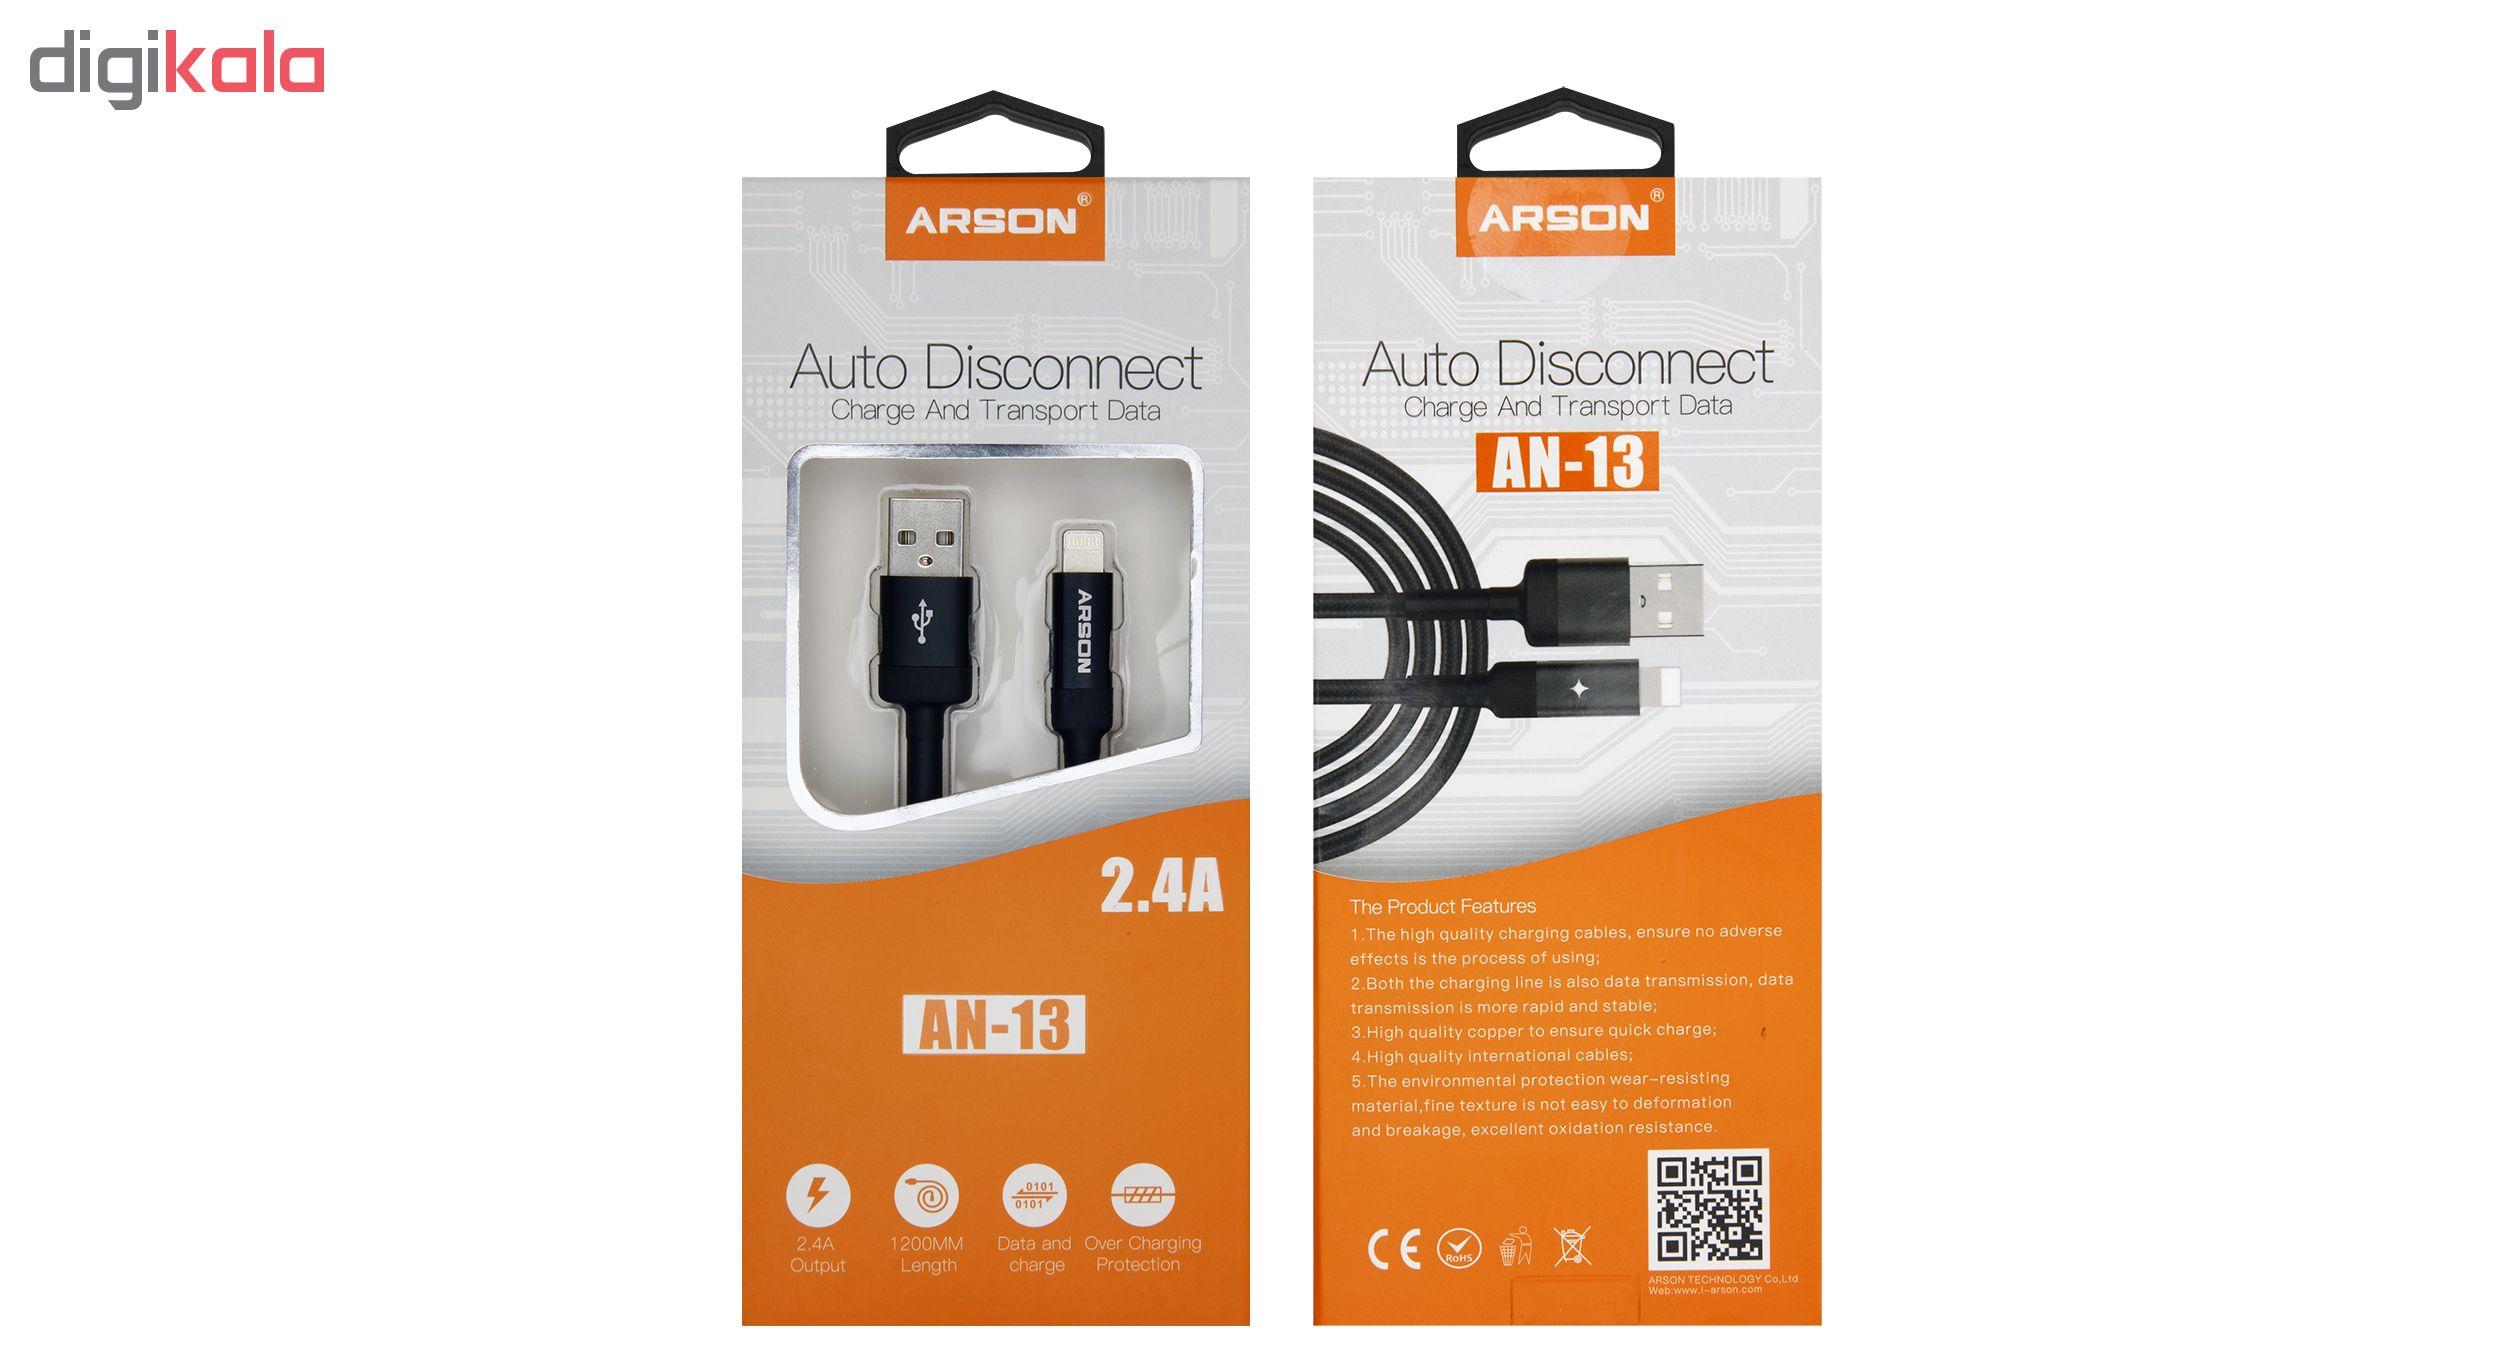 کابل تبدیل USB به لایتنینگ آرسون مدل AN-13 طول 1.2 متر thumb 2 5